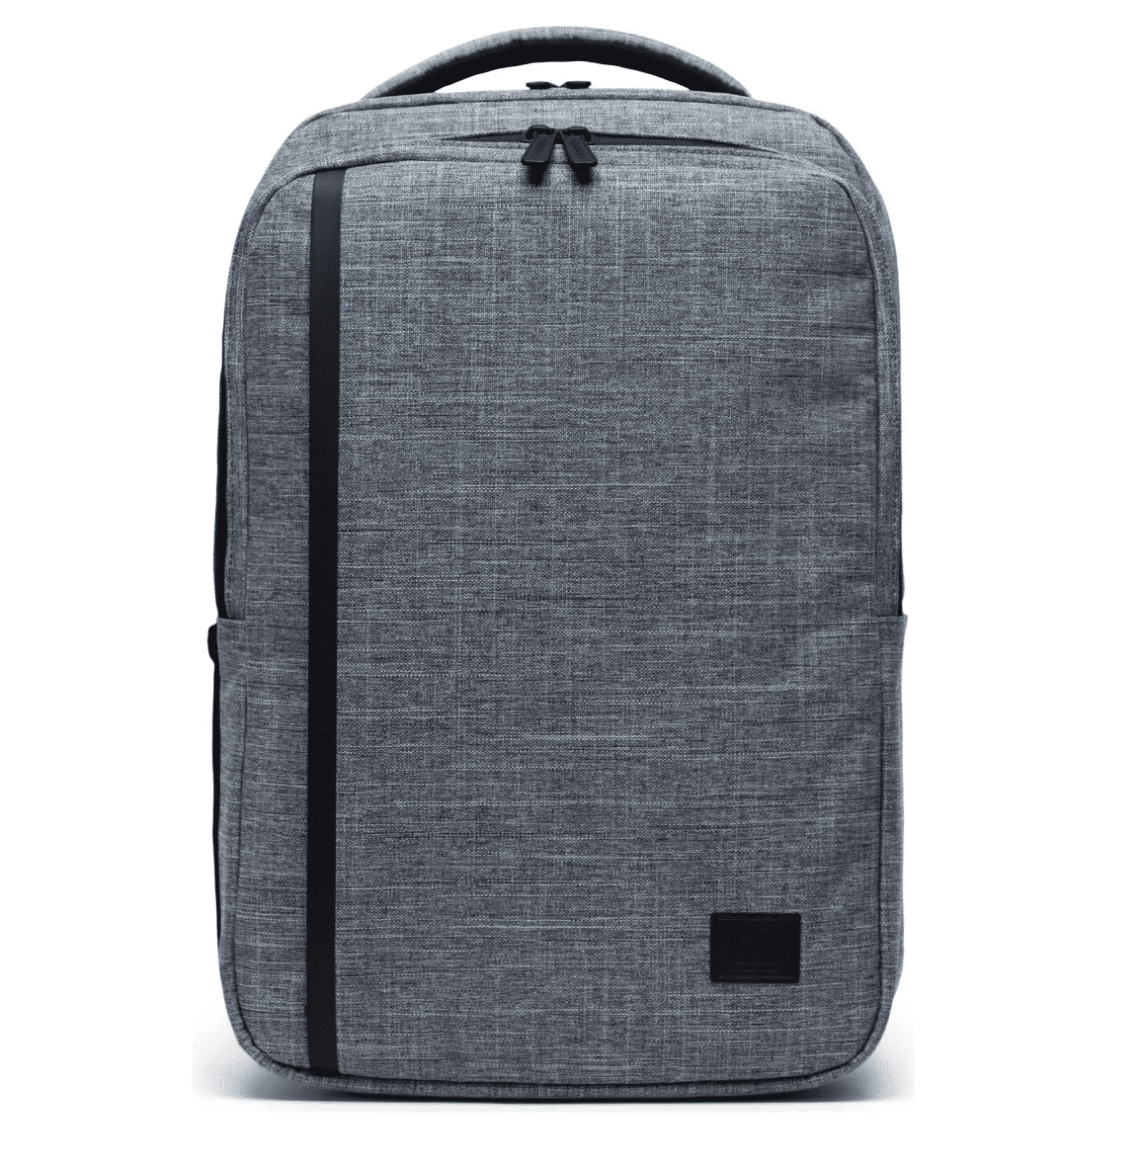 best gifts for him modern laptop bag